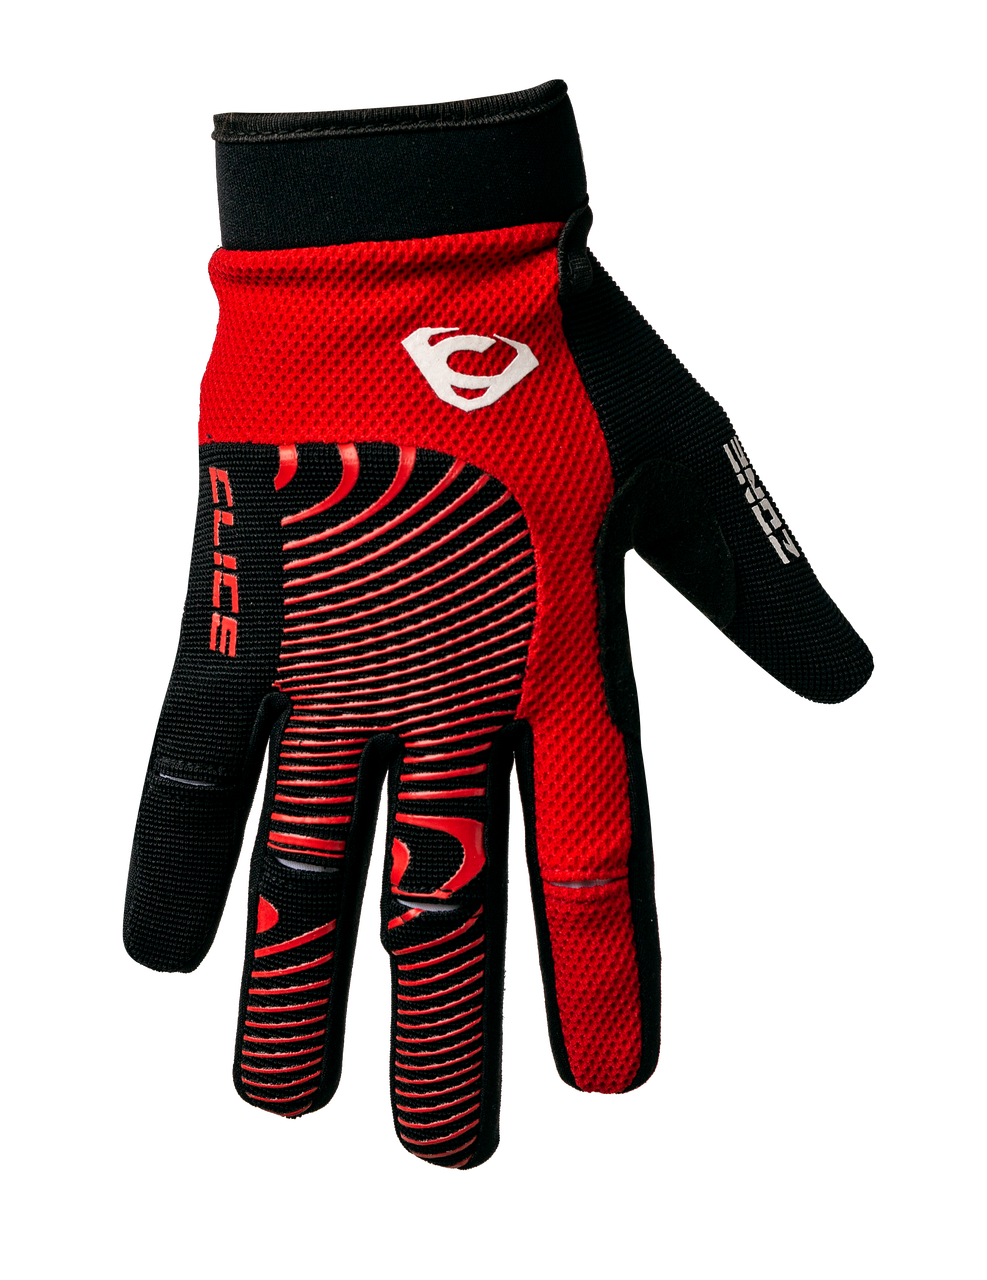 2019 Clice Zone trial glove, red